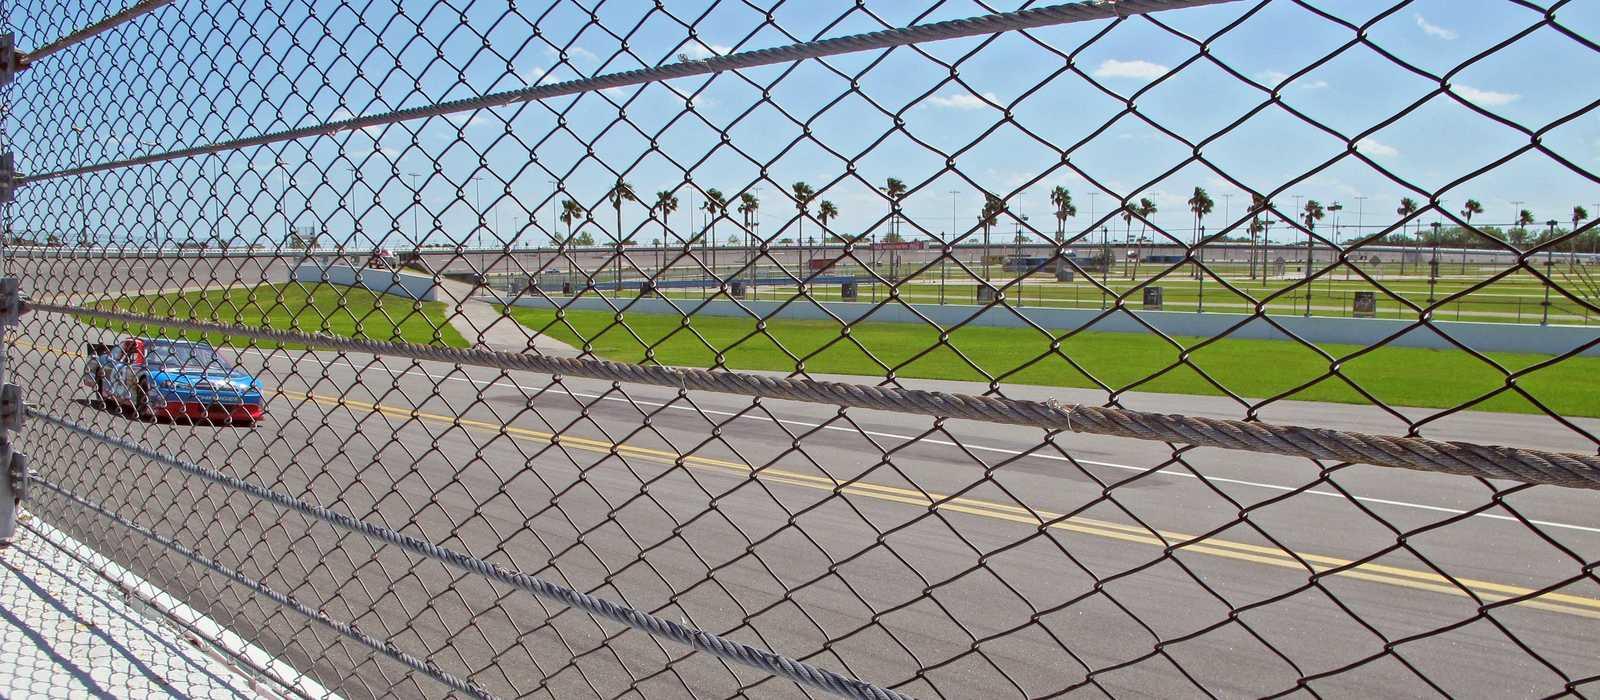 Am Daytona International Speedway